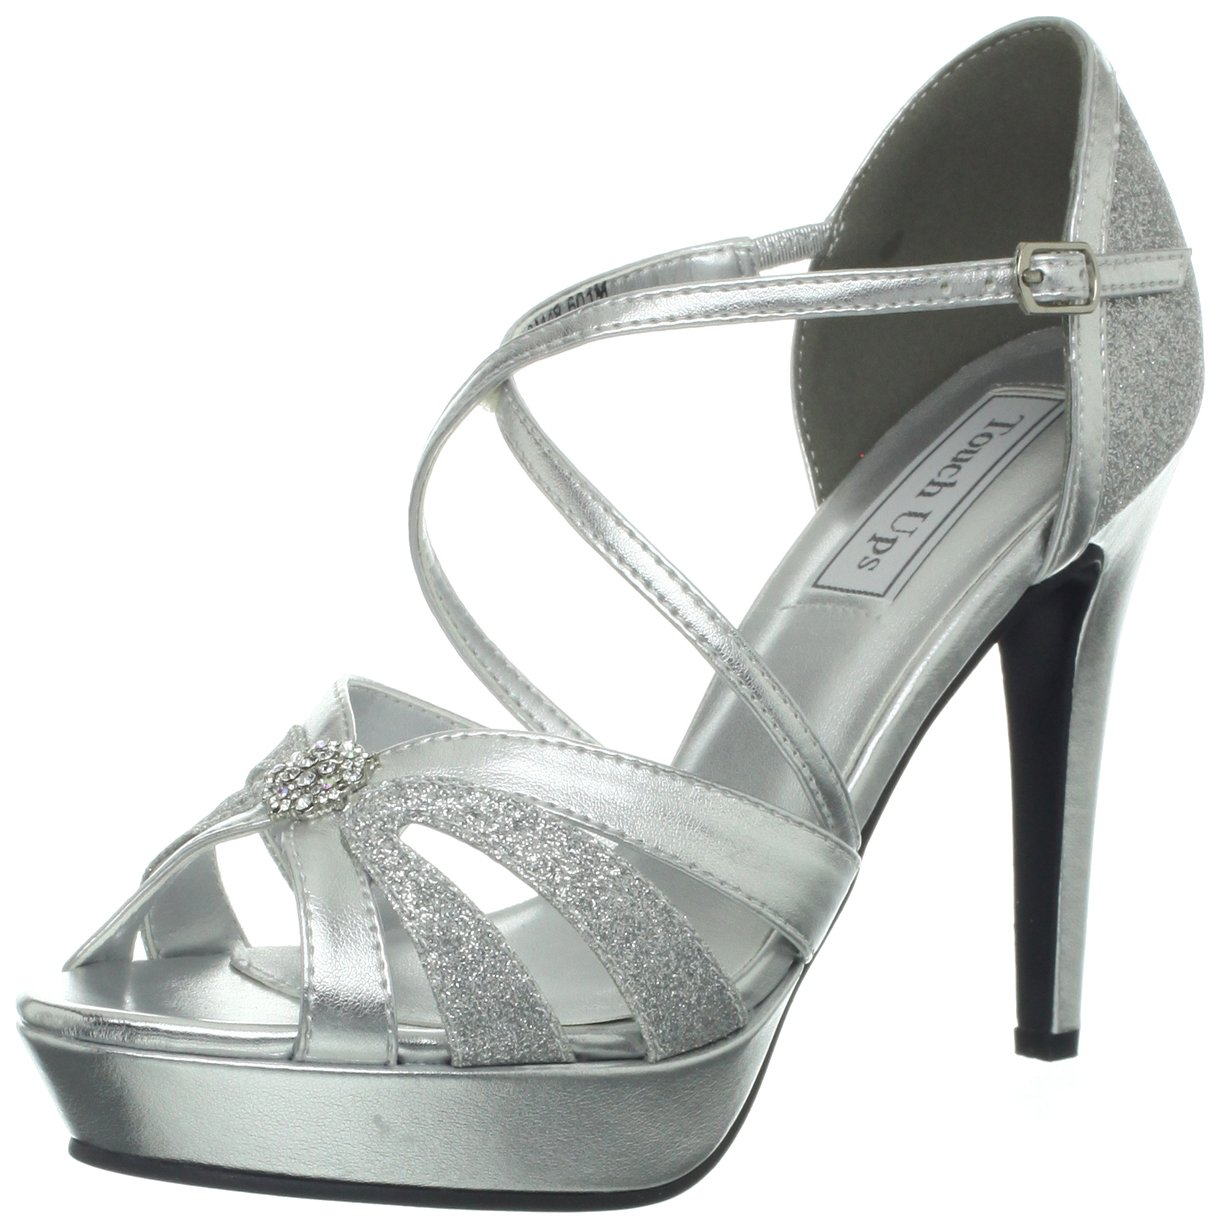 Touch Ups Women's Stella Sandal B00CQI0I4W 9 B(M) US|Silver Metallic